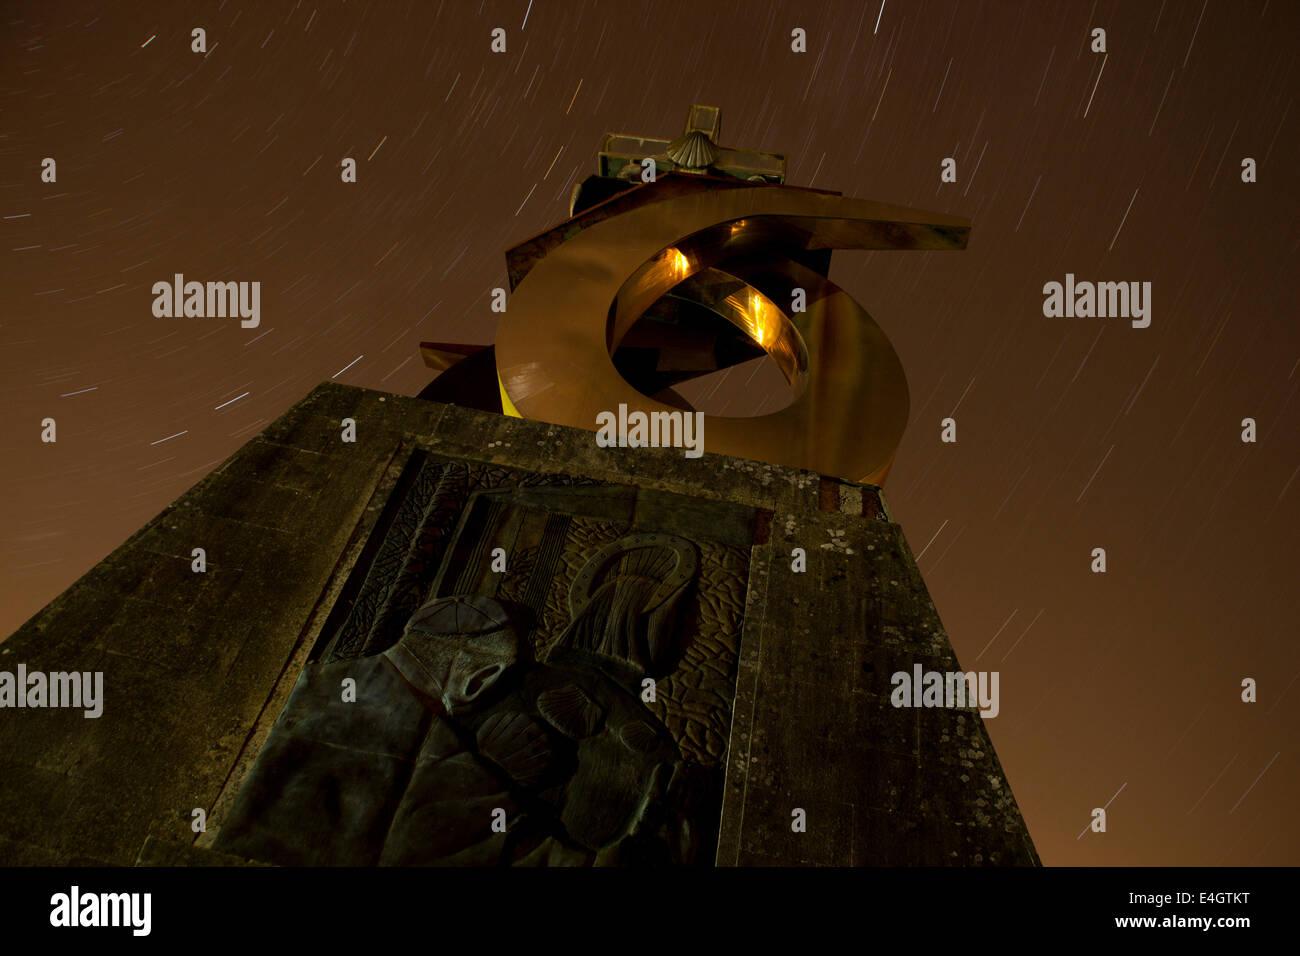 Monto do gozo at night - Great walk of St. James, Jakobsweg, Camino de Santiago, Spain - Stock Image